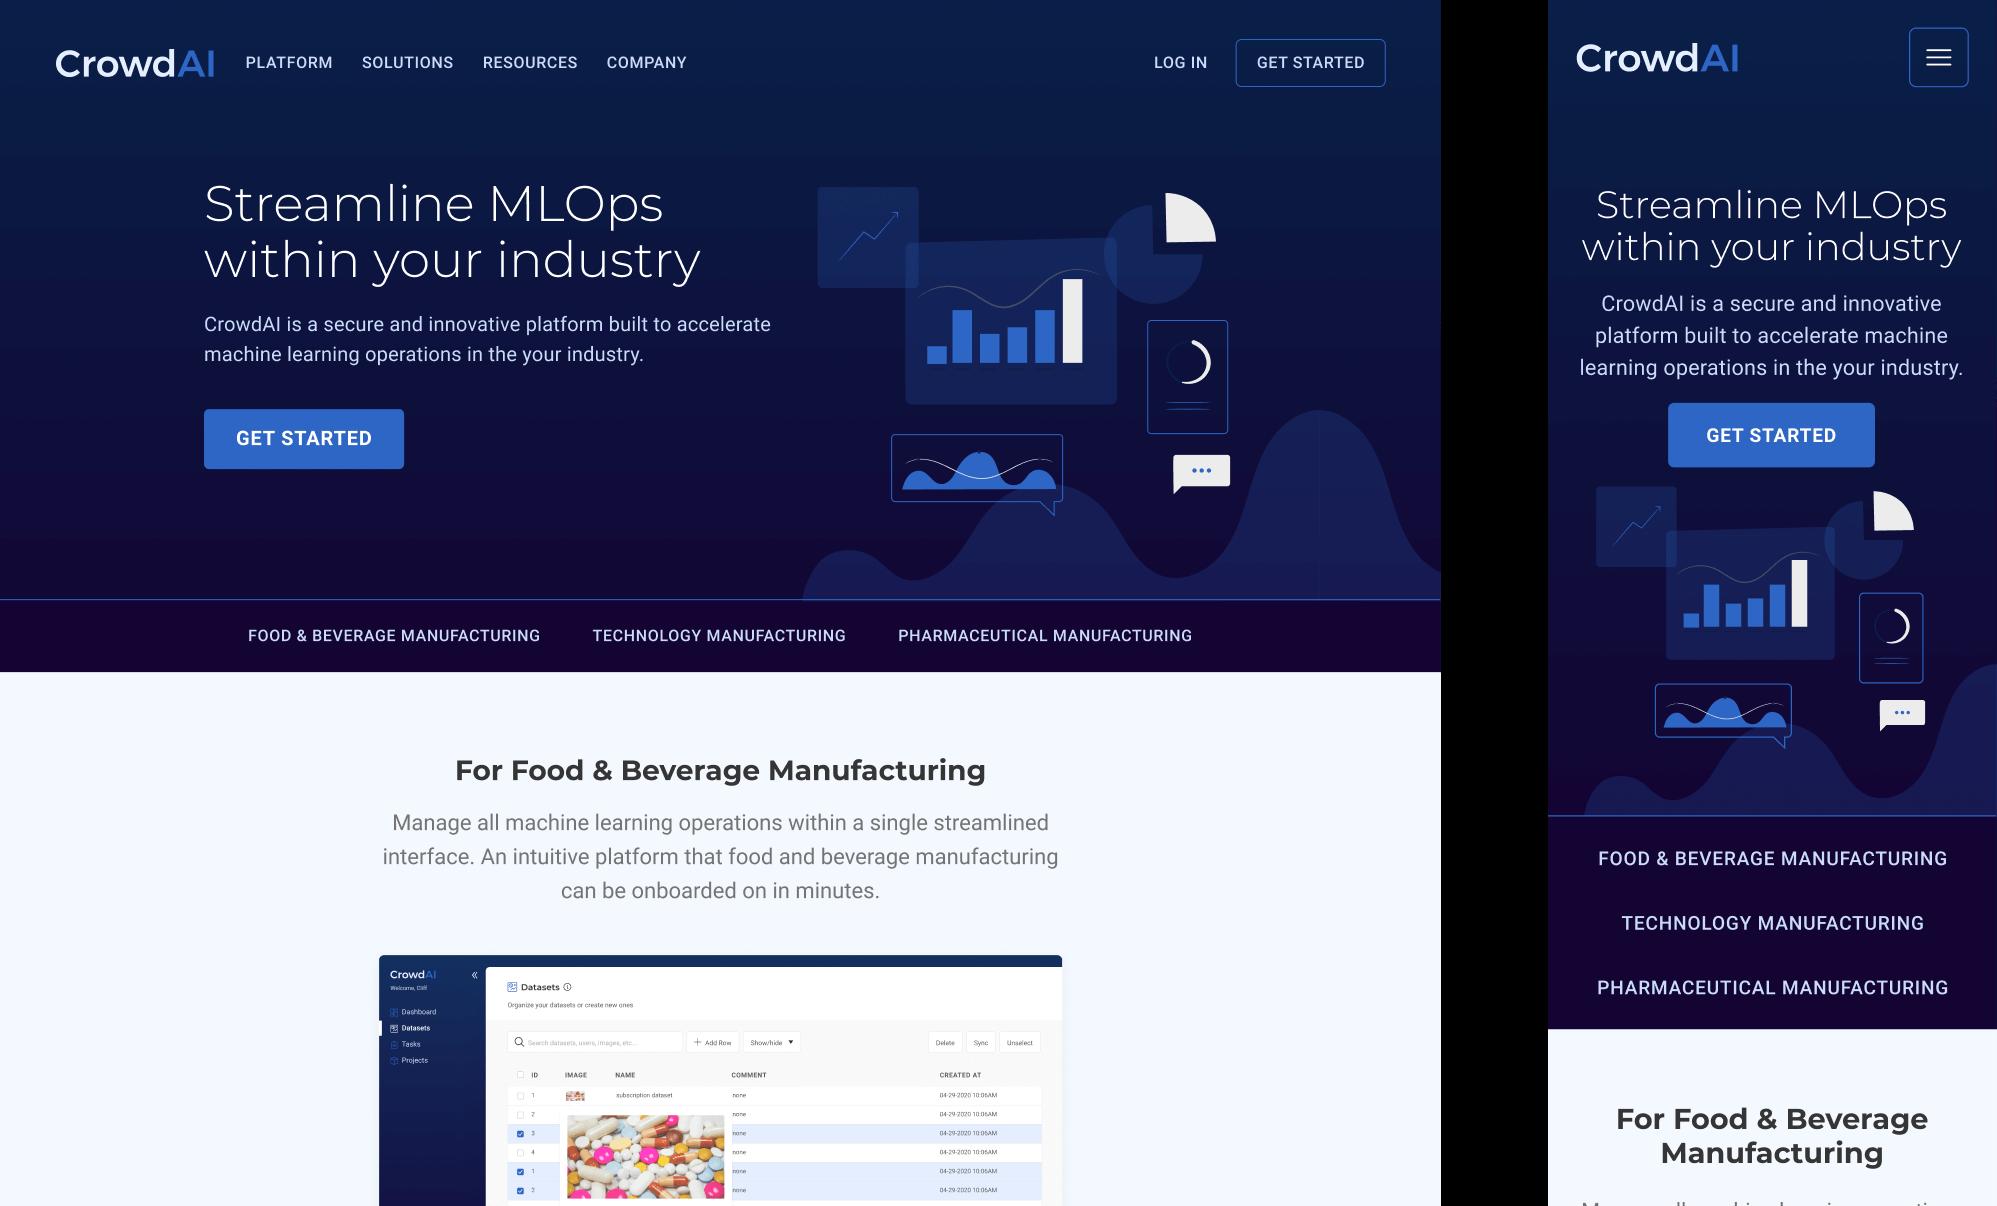 CrowdAI Homepage Graphic